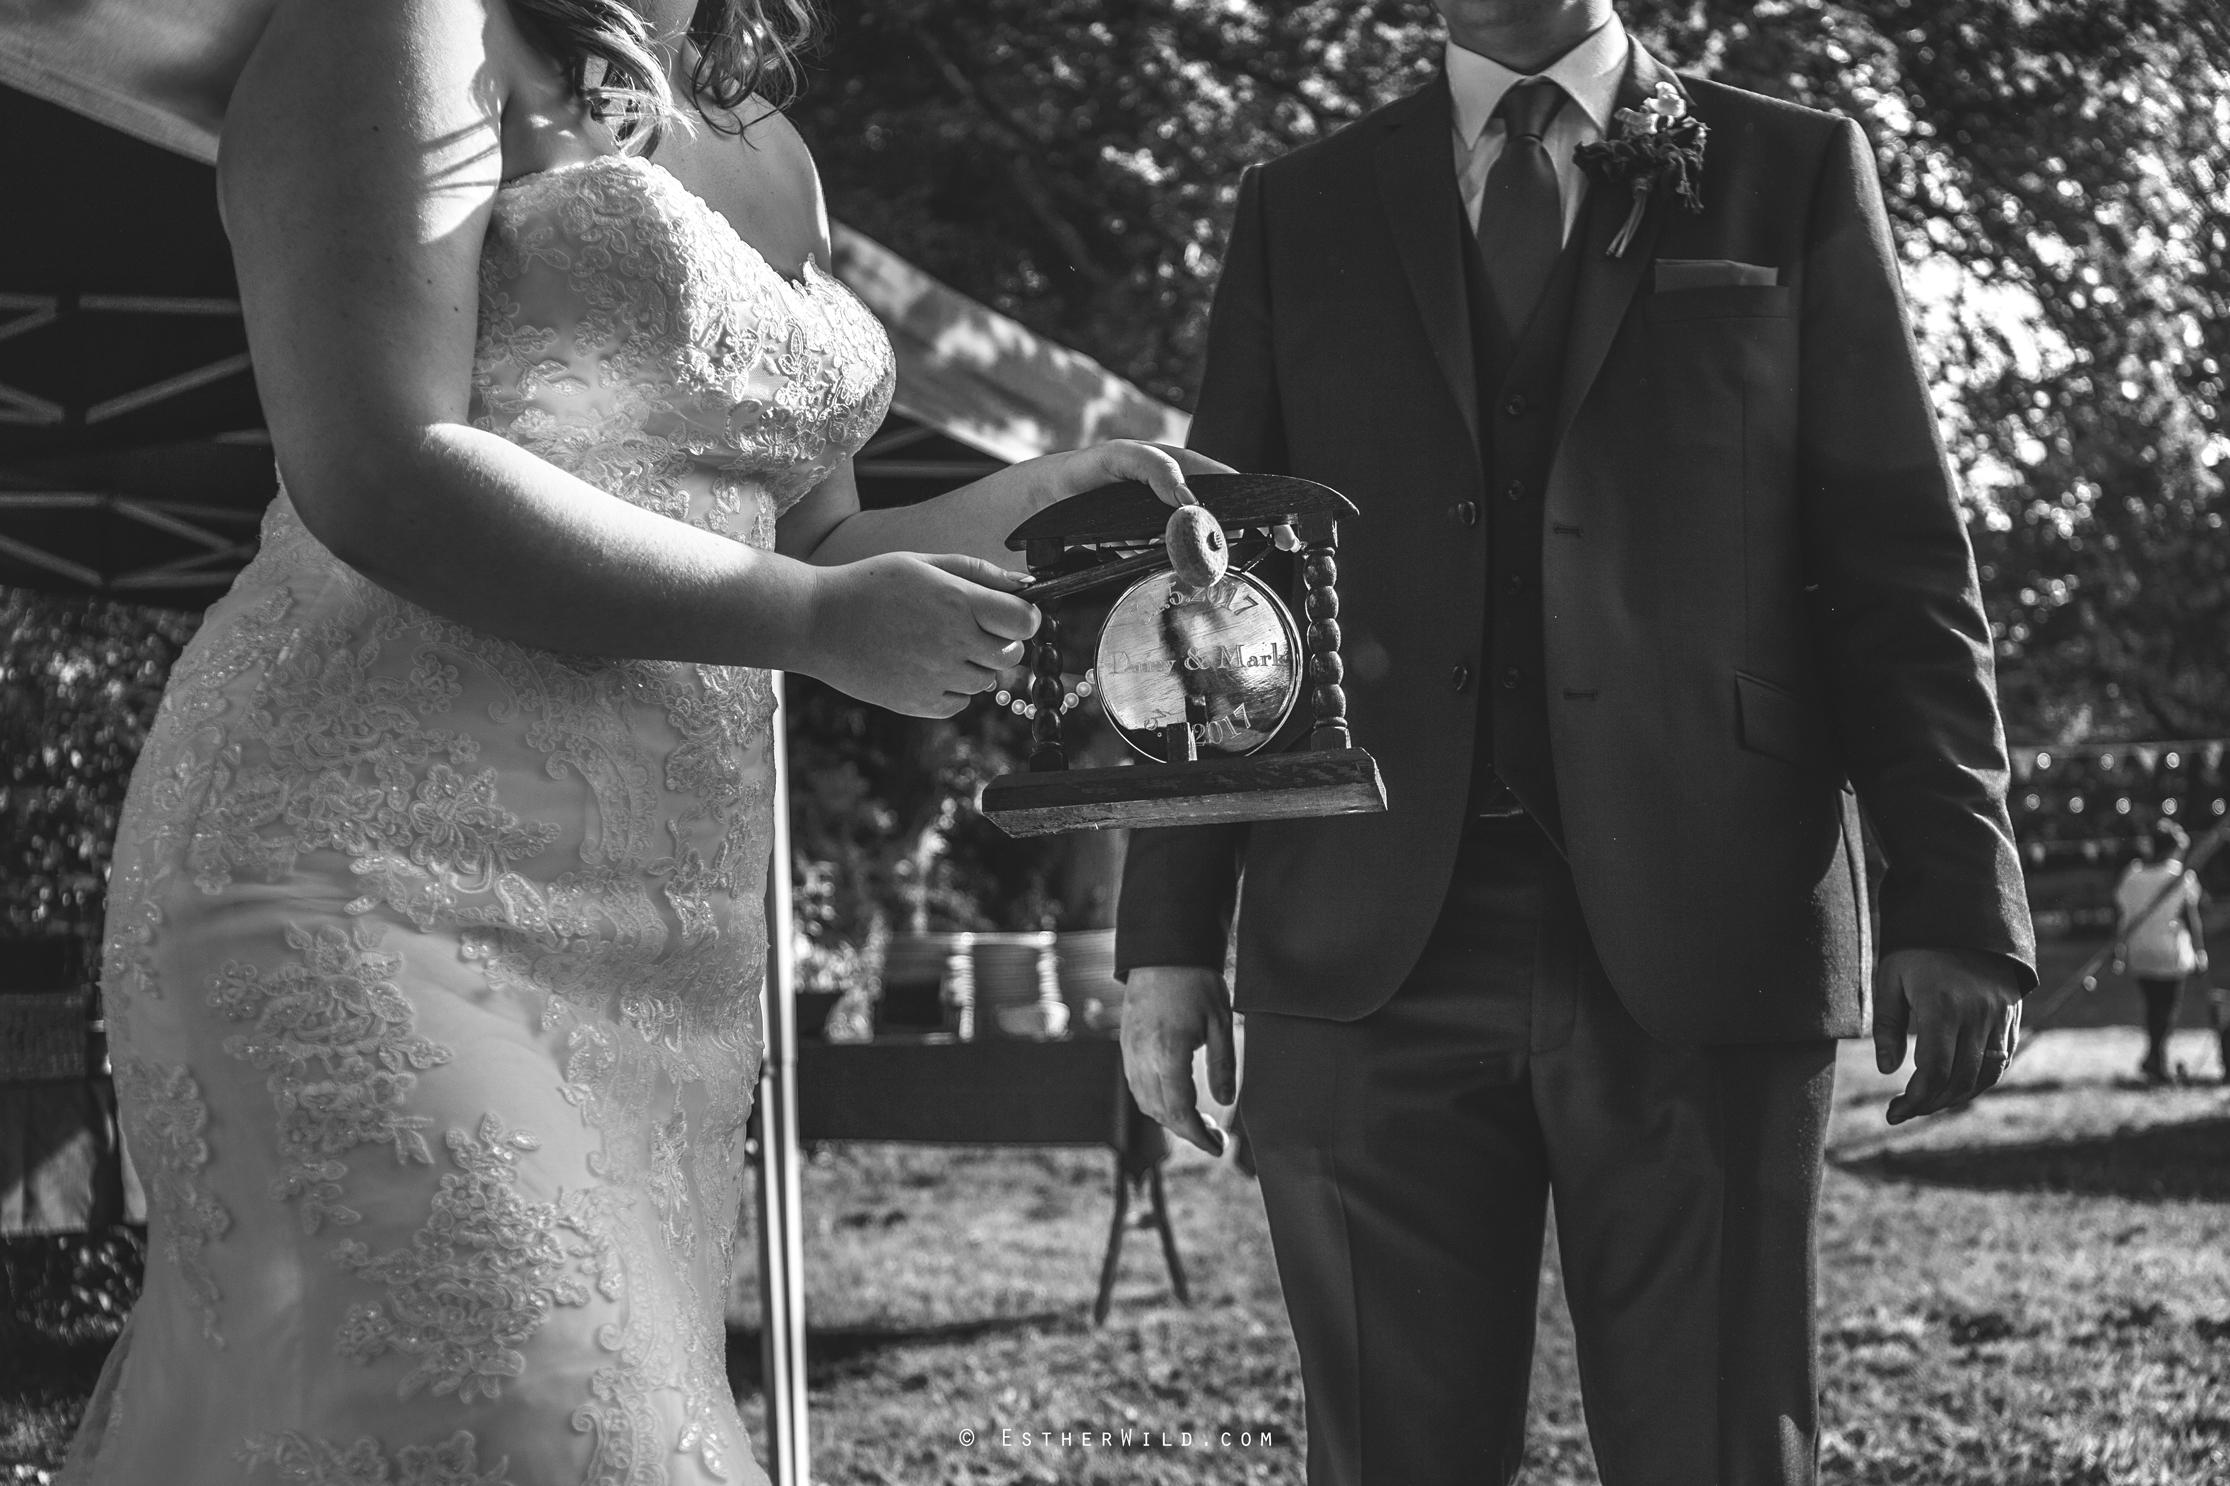 Norfolk_Wedding_Photographer_Mannington_Hall_Country_Esther_Wild_1977-1.jpg